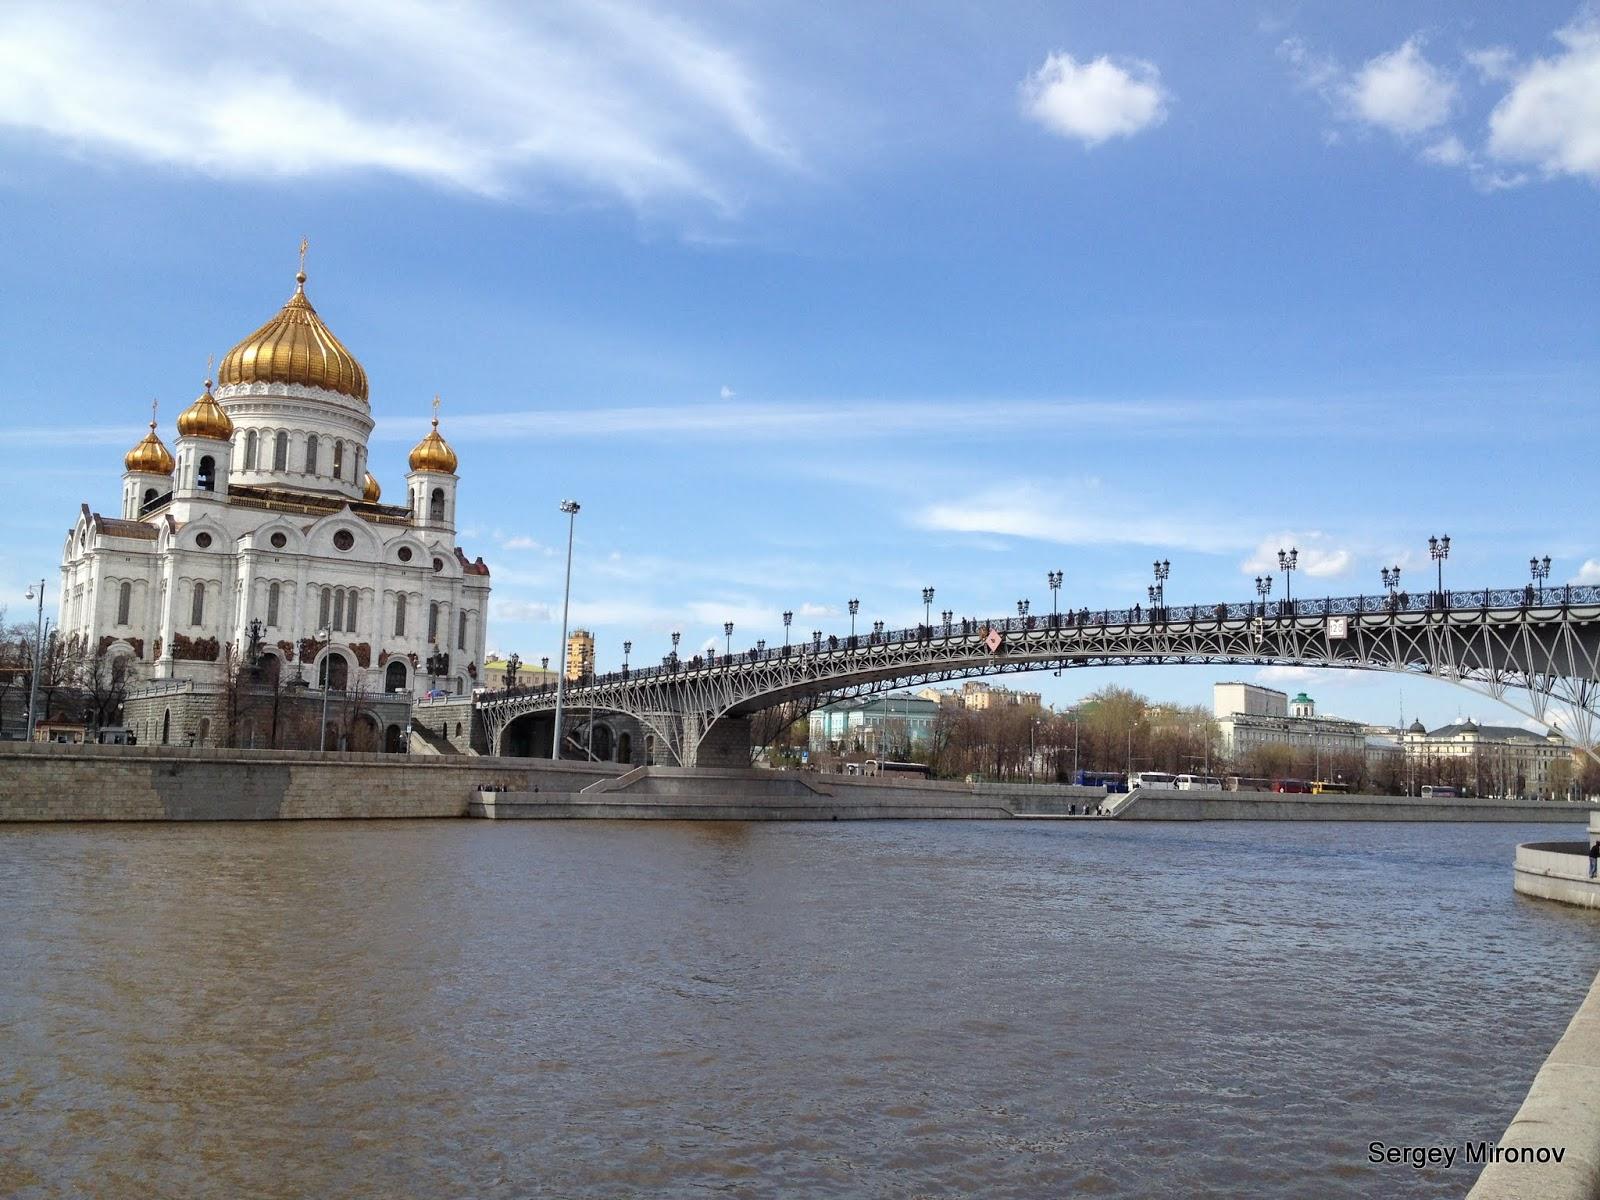 Фото Храма Христа Спасителя и Патриаршего моста в Москве